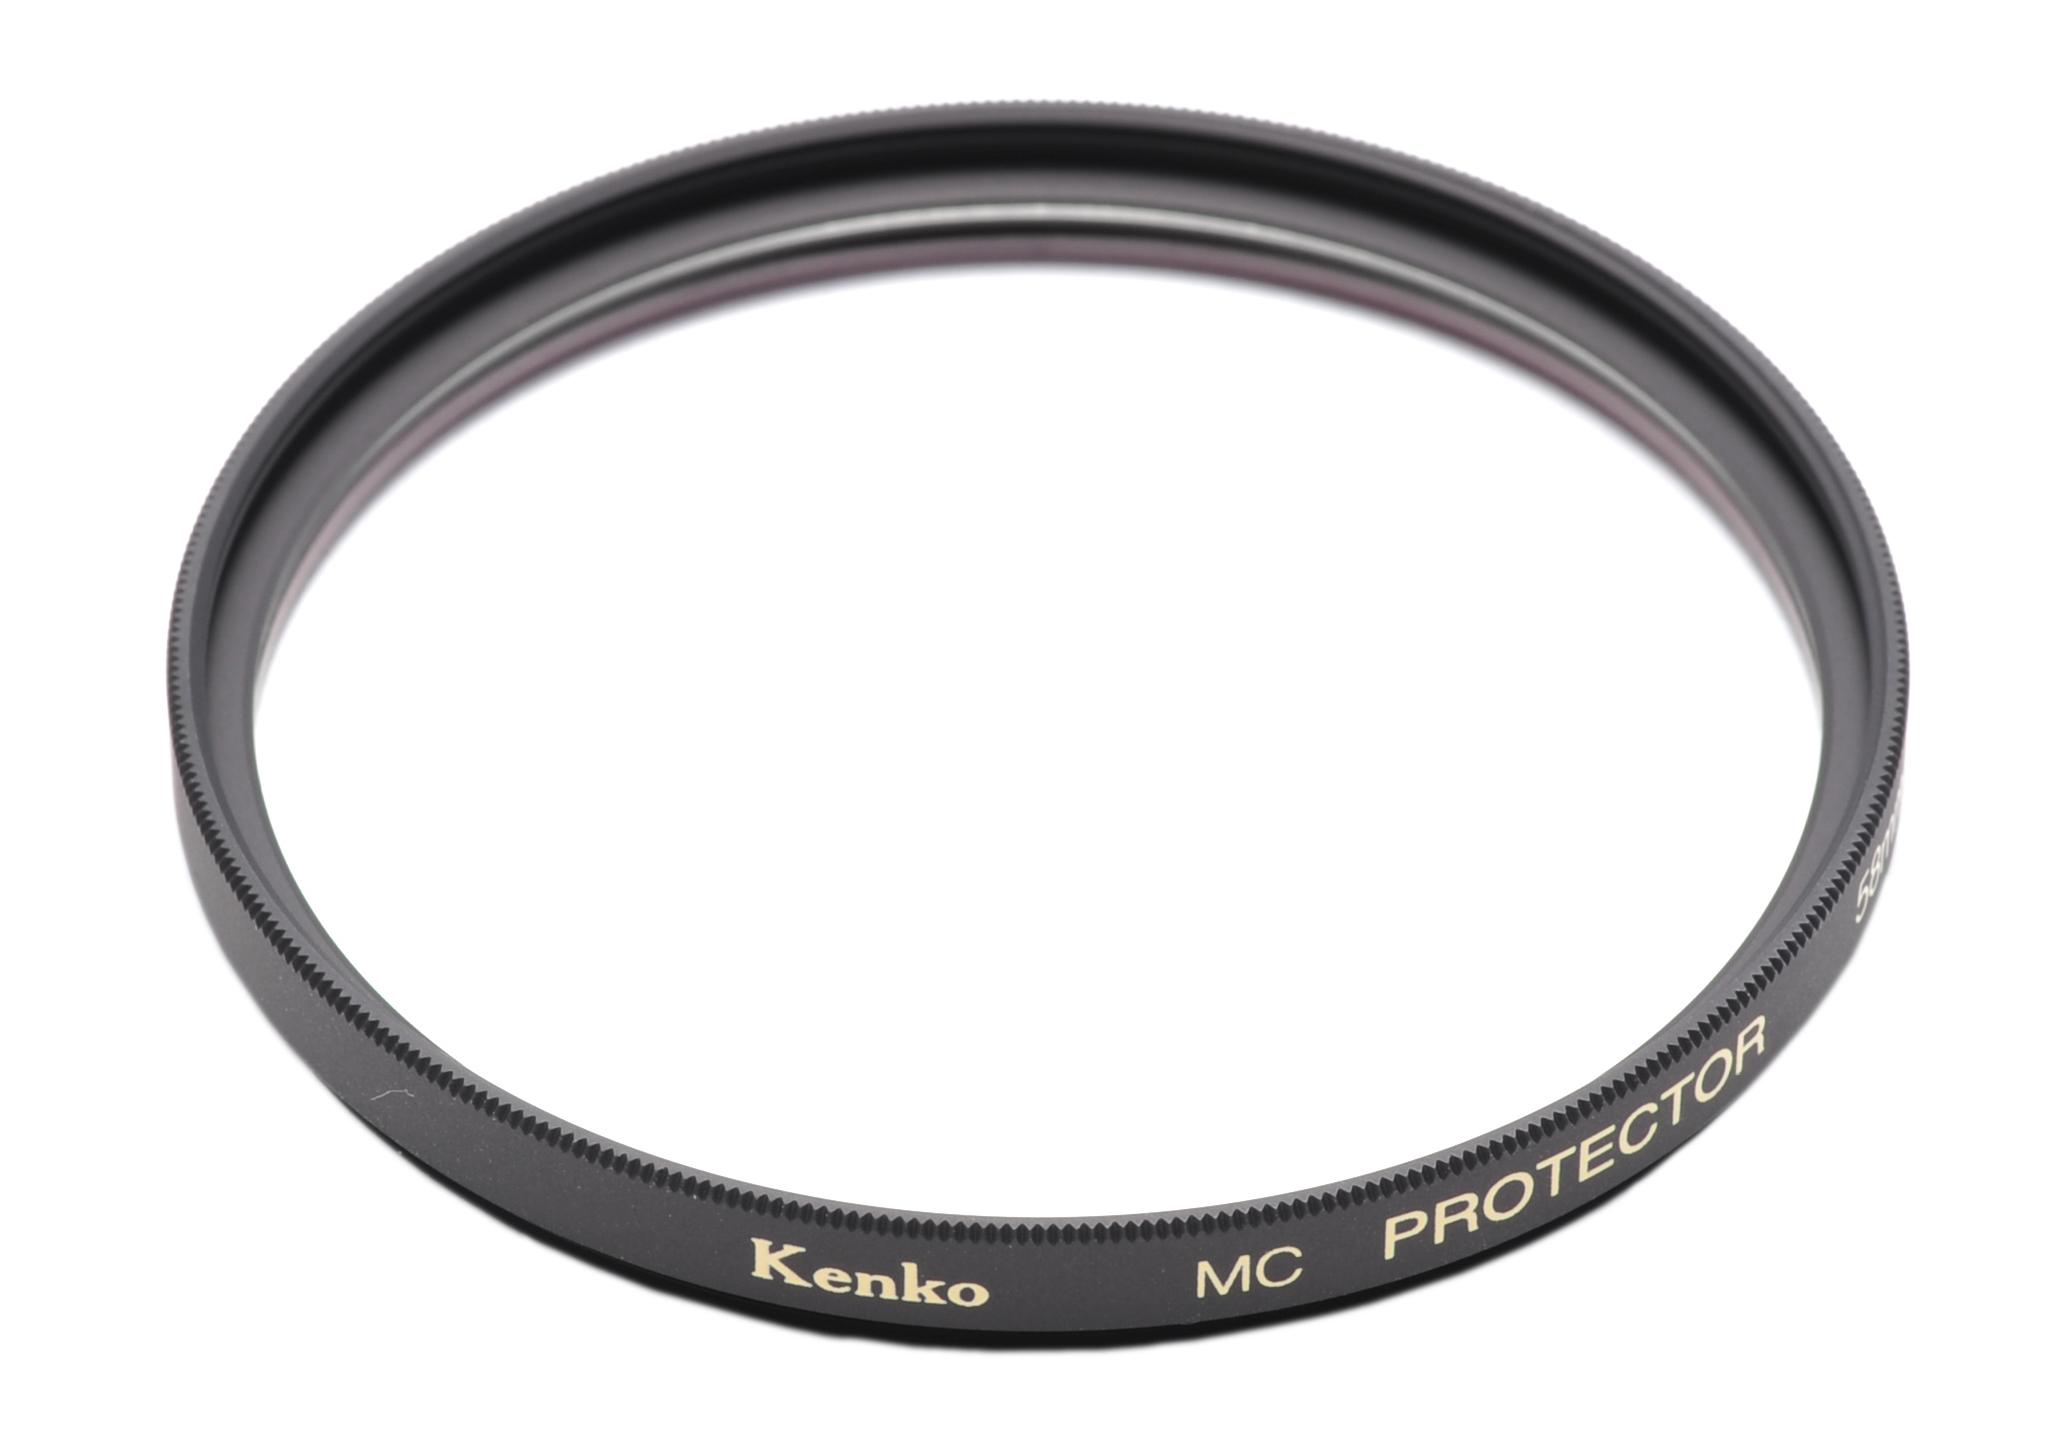 Foto & Camcorder Sony Filtern Mc Protector Und Pl